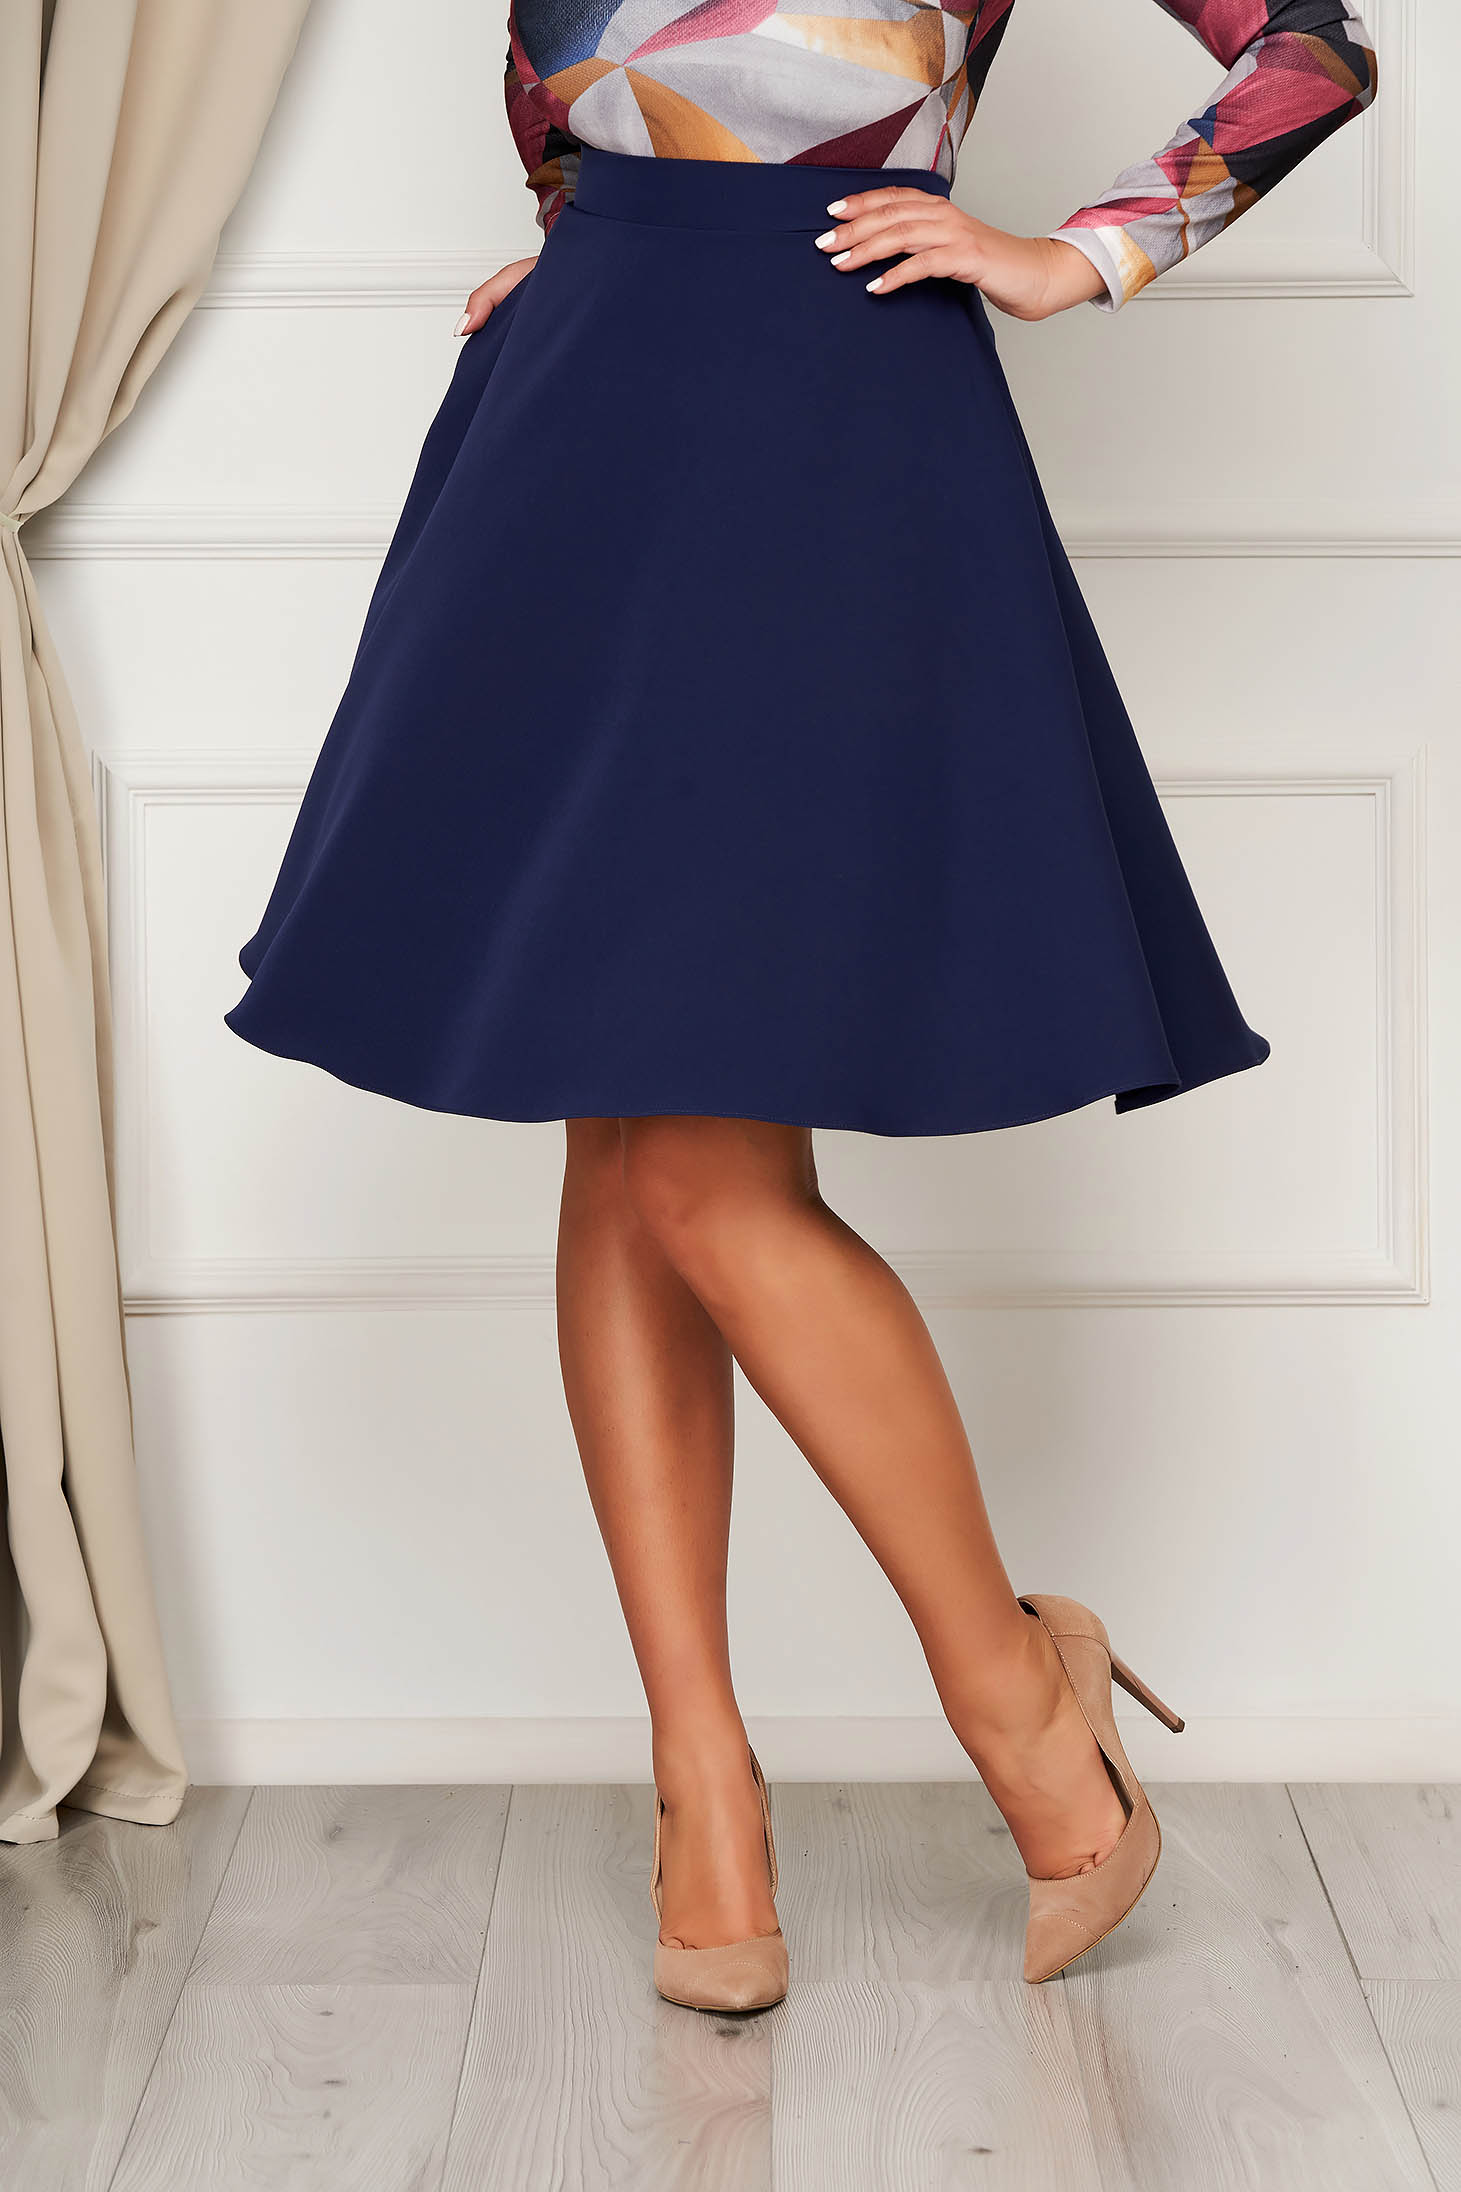 Fusta StarShinerS albastru-inchis midi eleganta in clos cu talie inalta cu buzunare fara captuseala